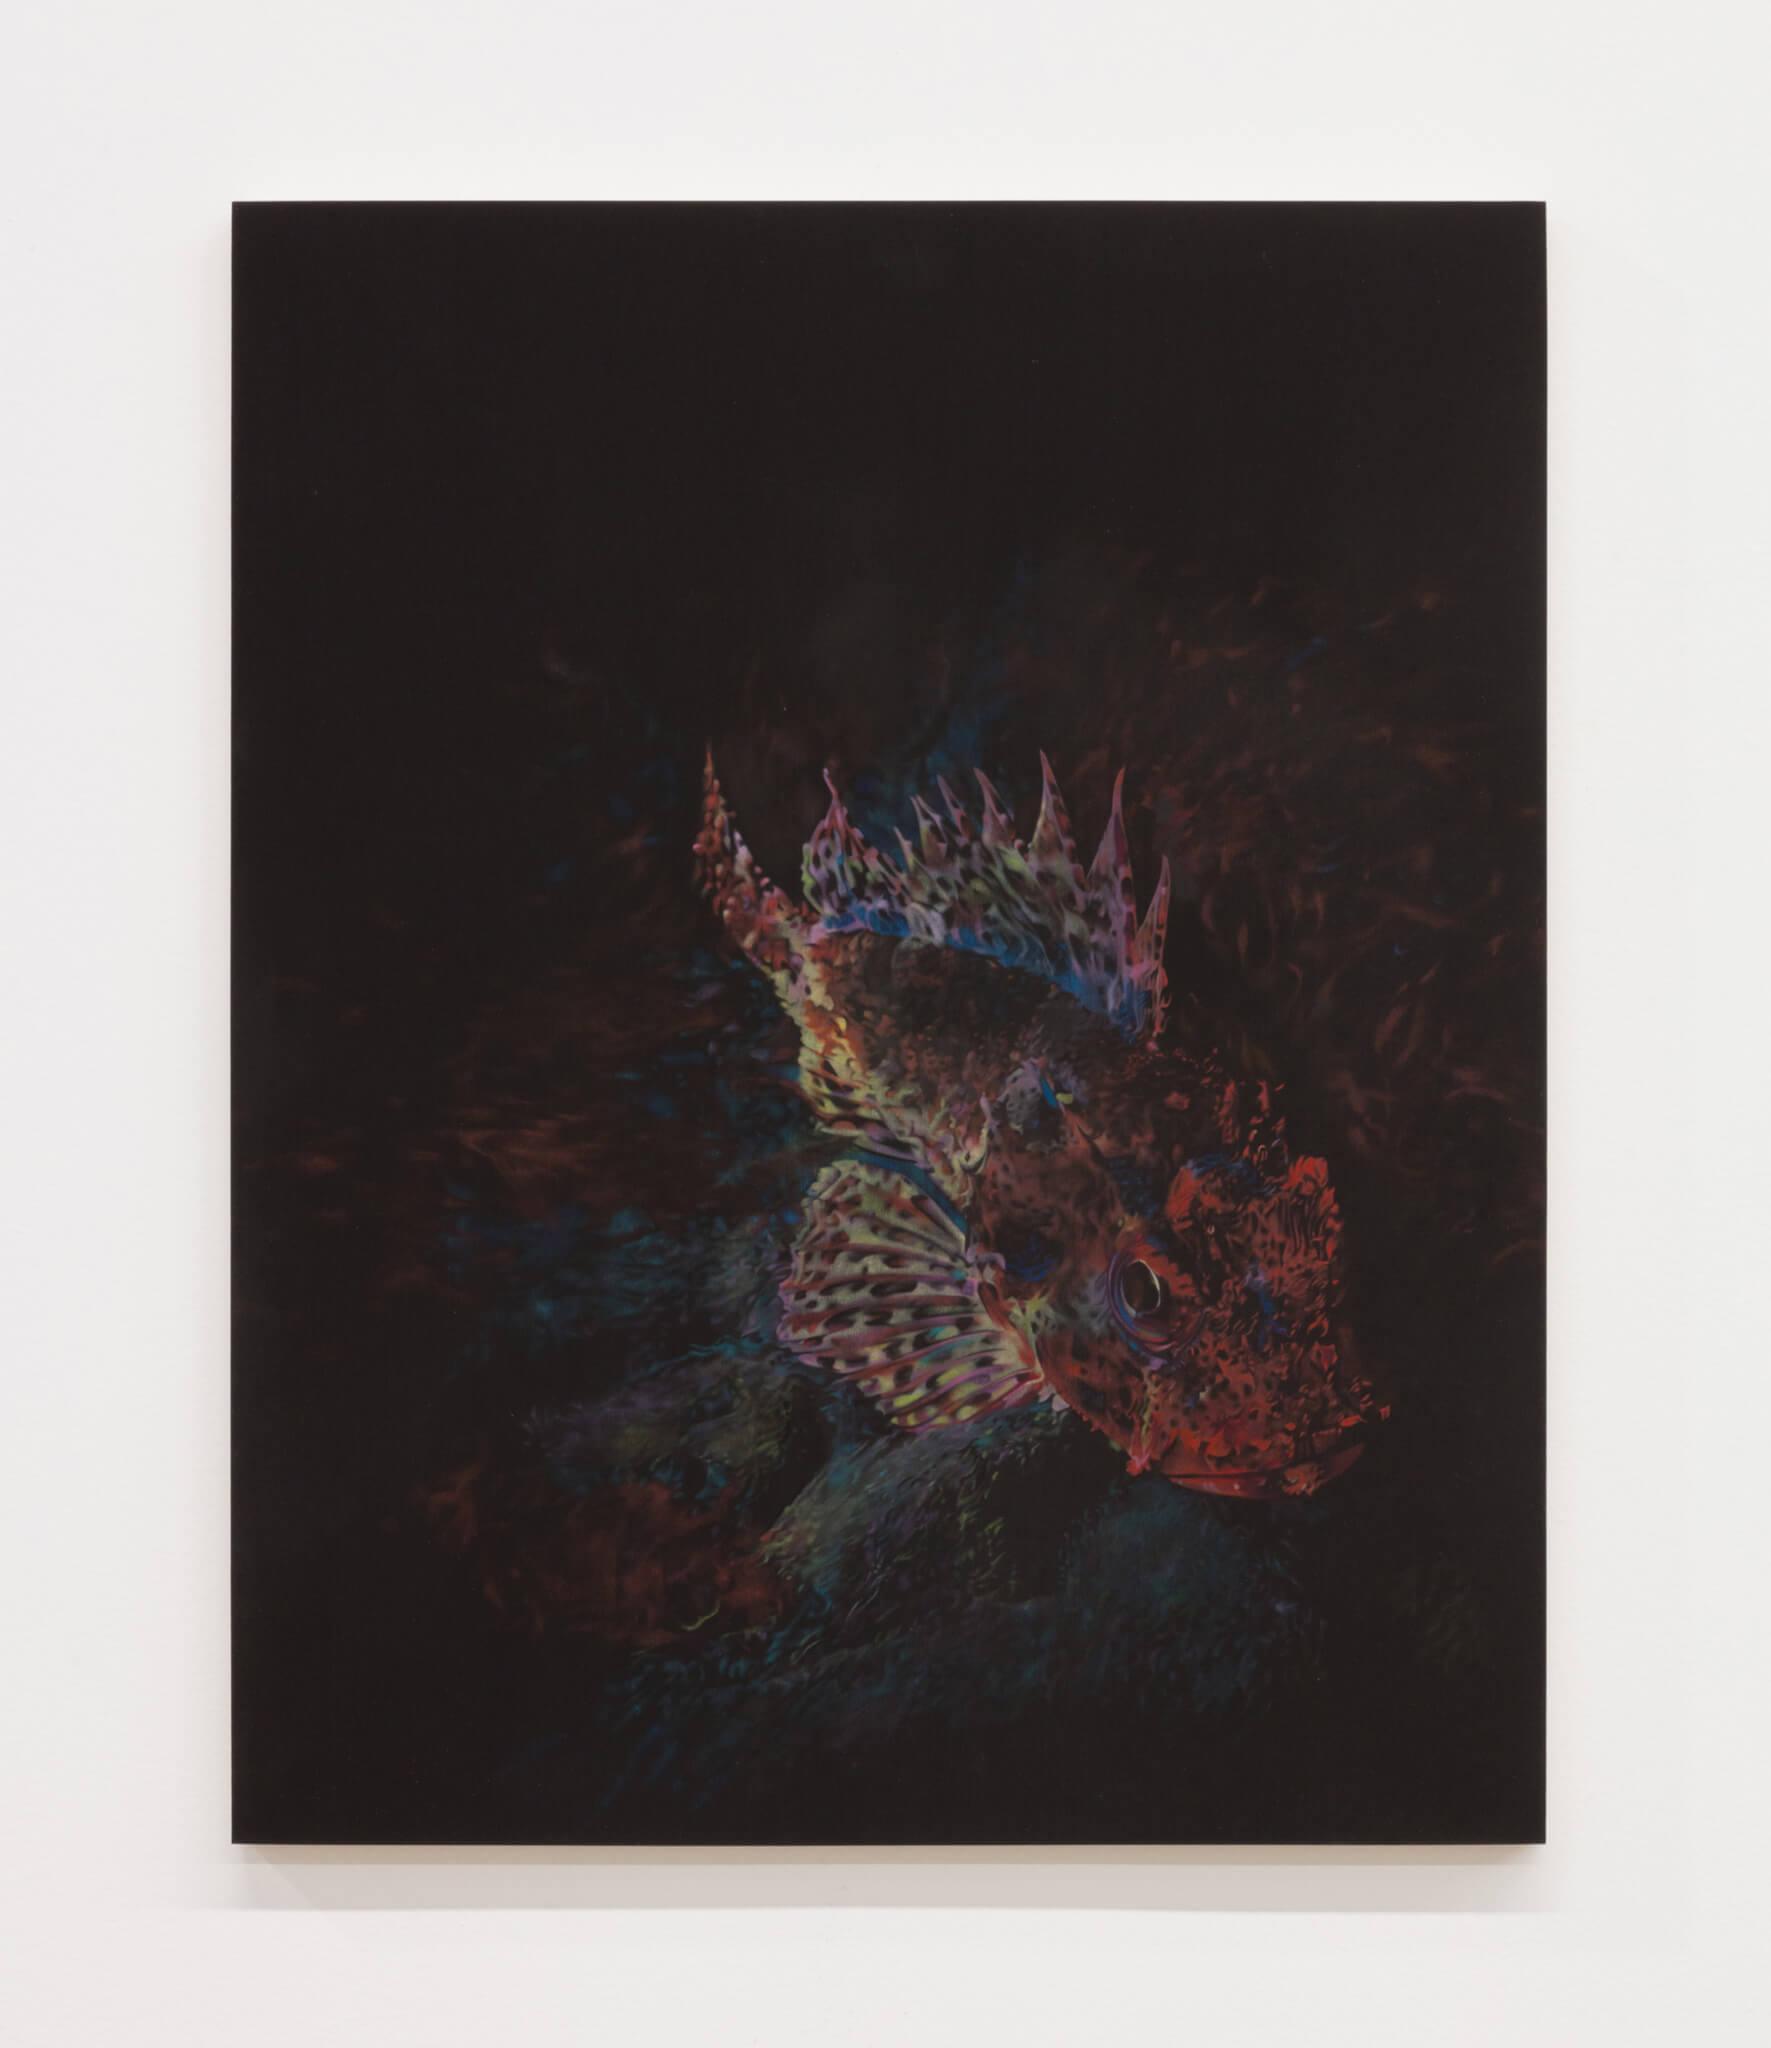 Mann, California Scorpionfish, 2020 (BM 20.001) A copy